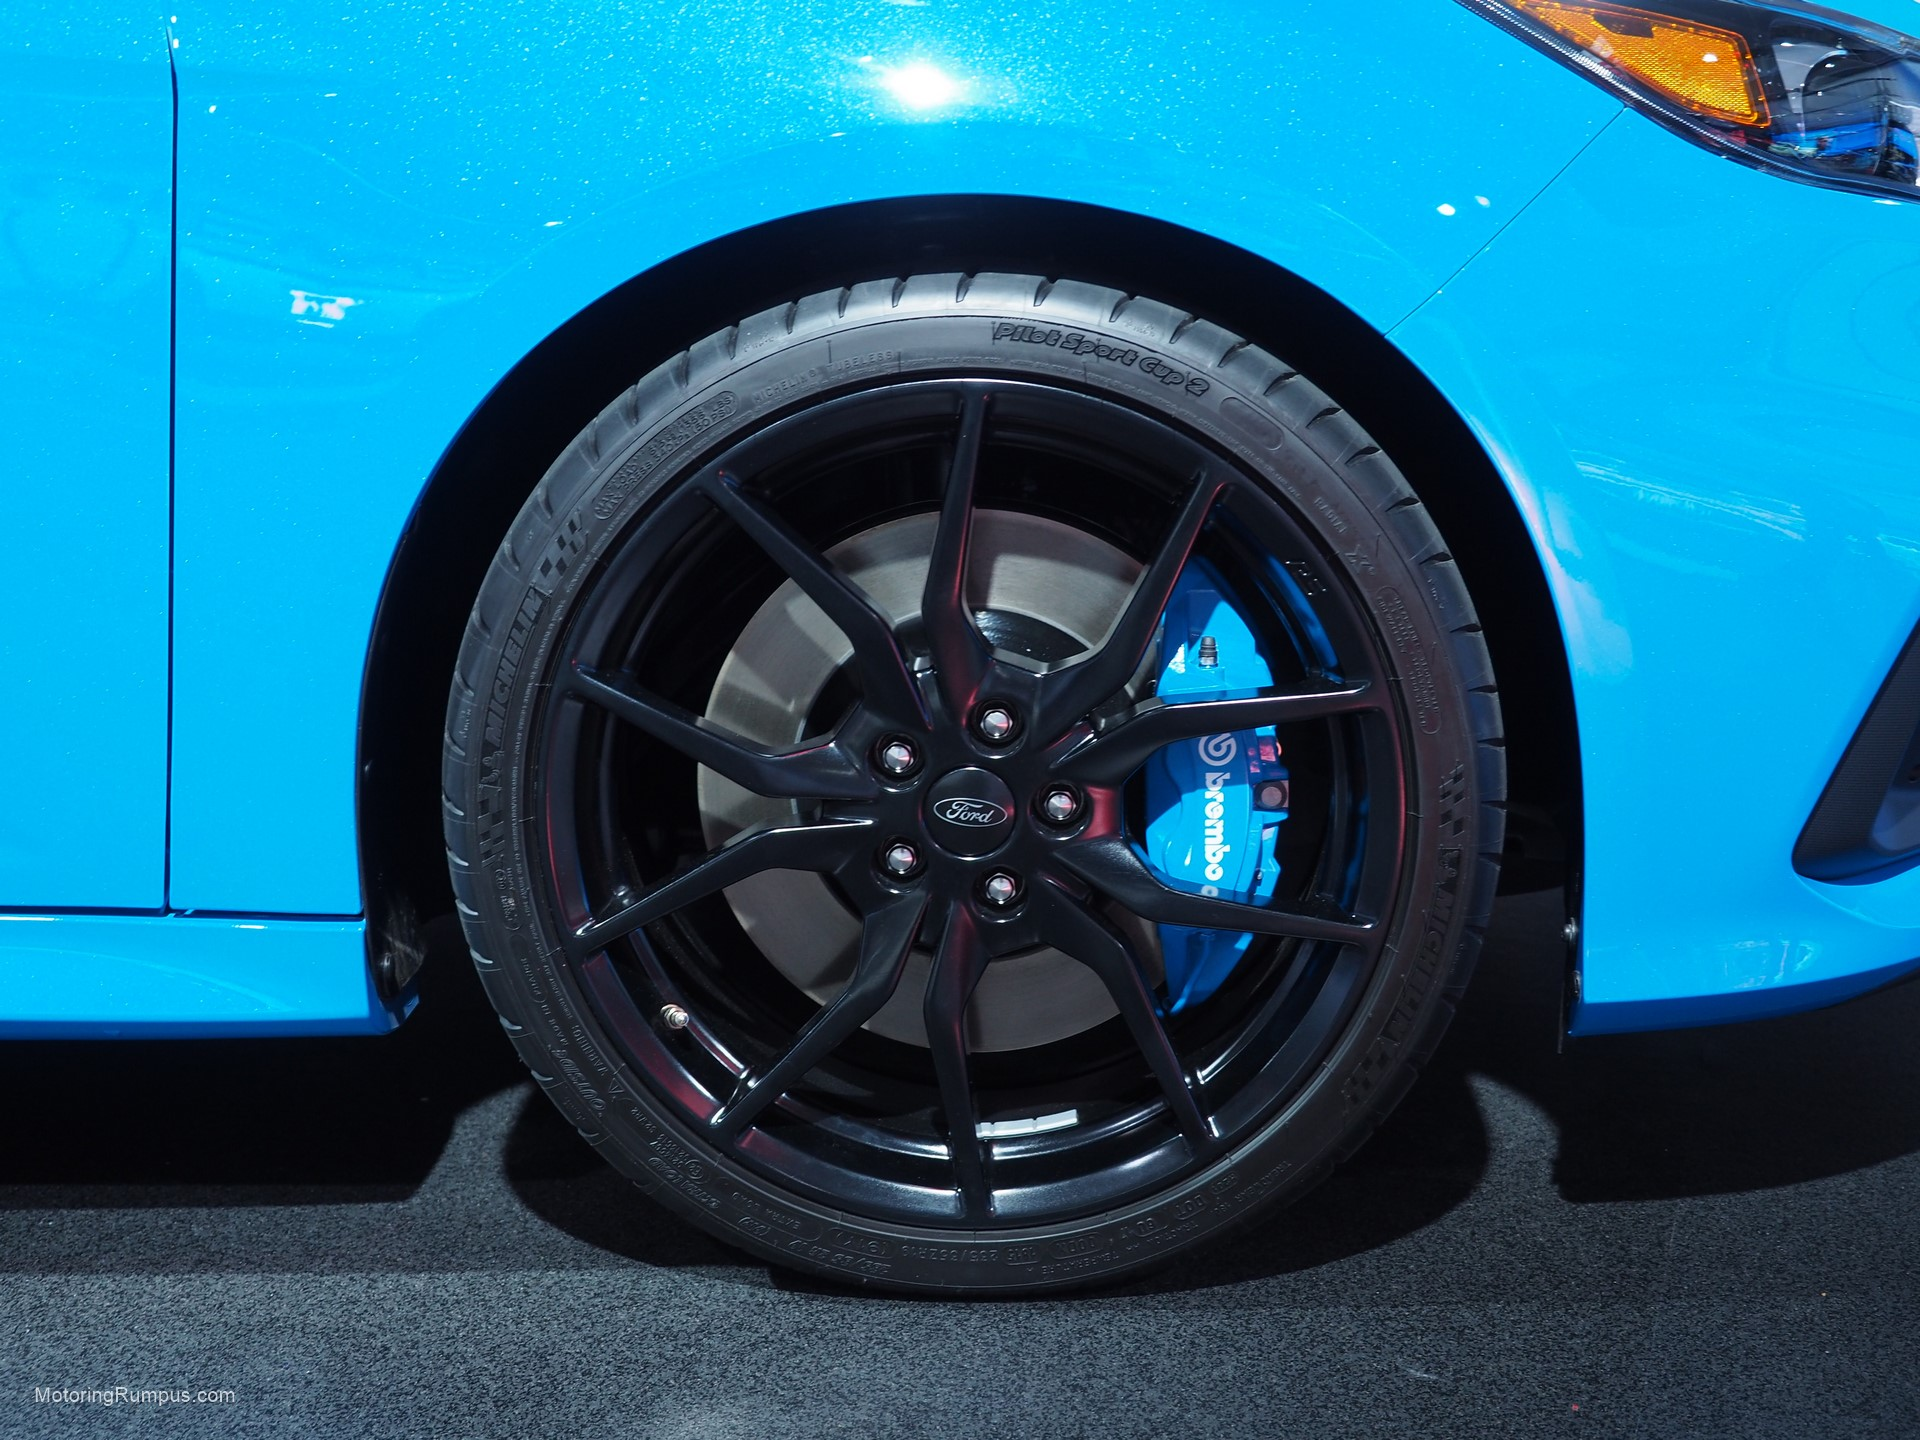 2016 NAIAS Ford Focus RS 19-inch Wheel